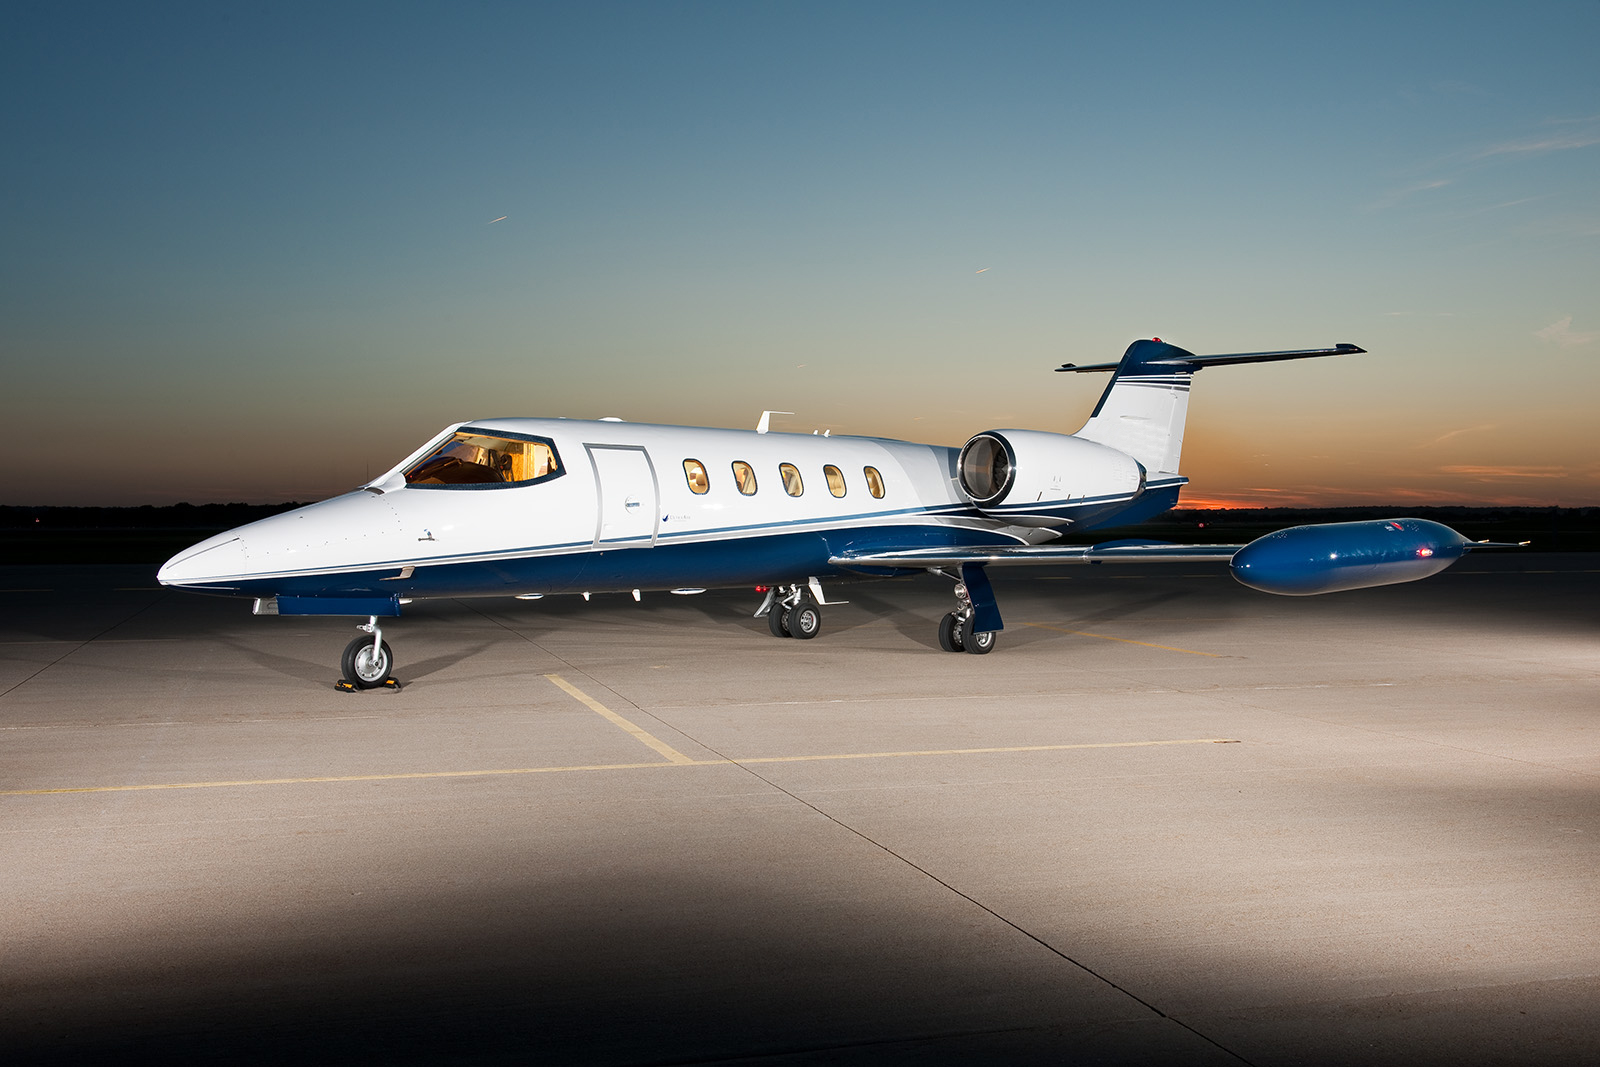 Lear 35 on ground